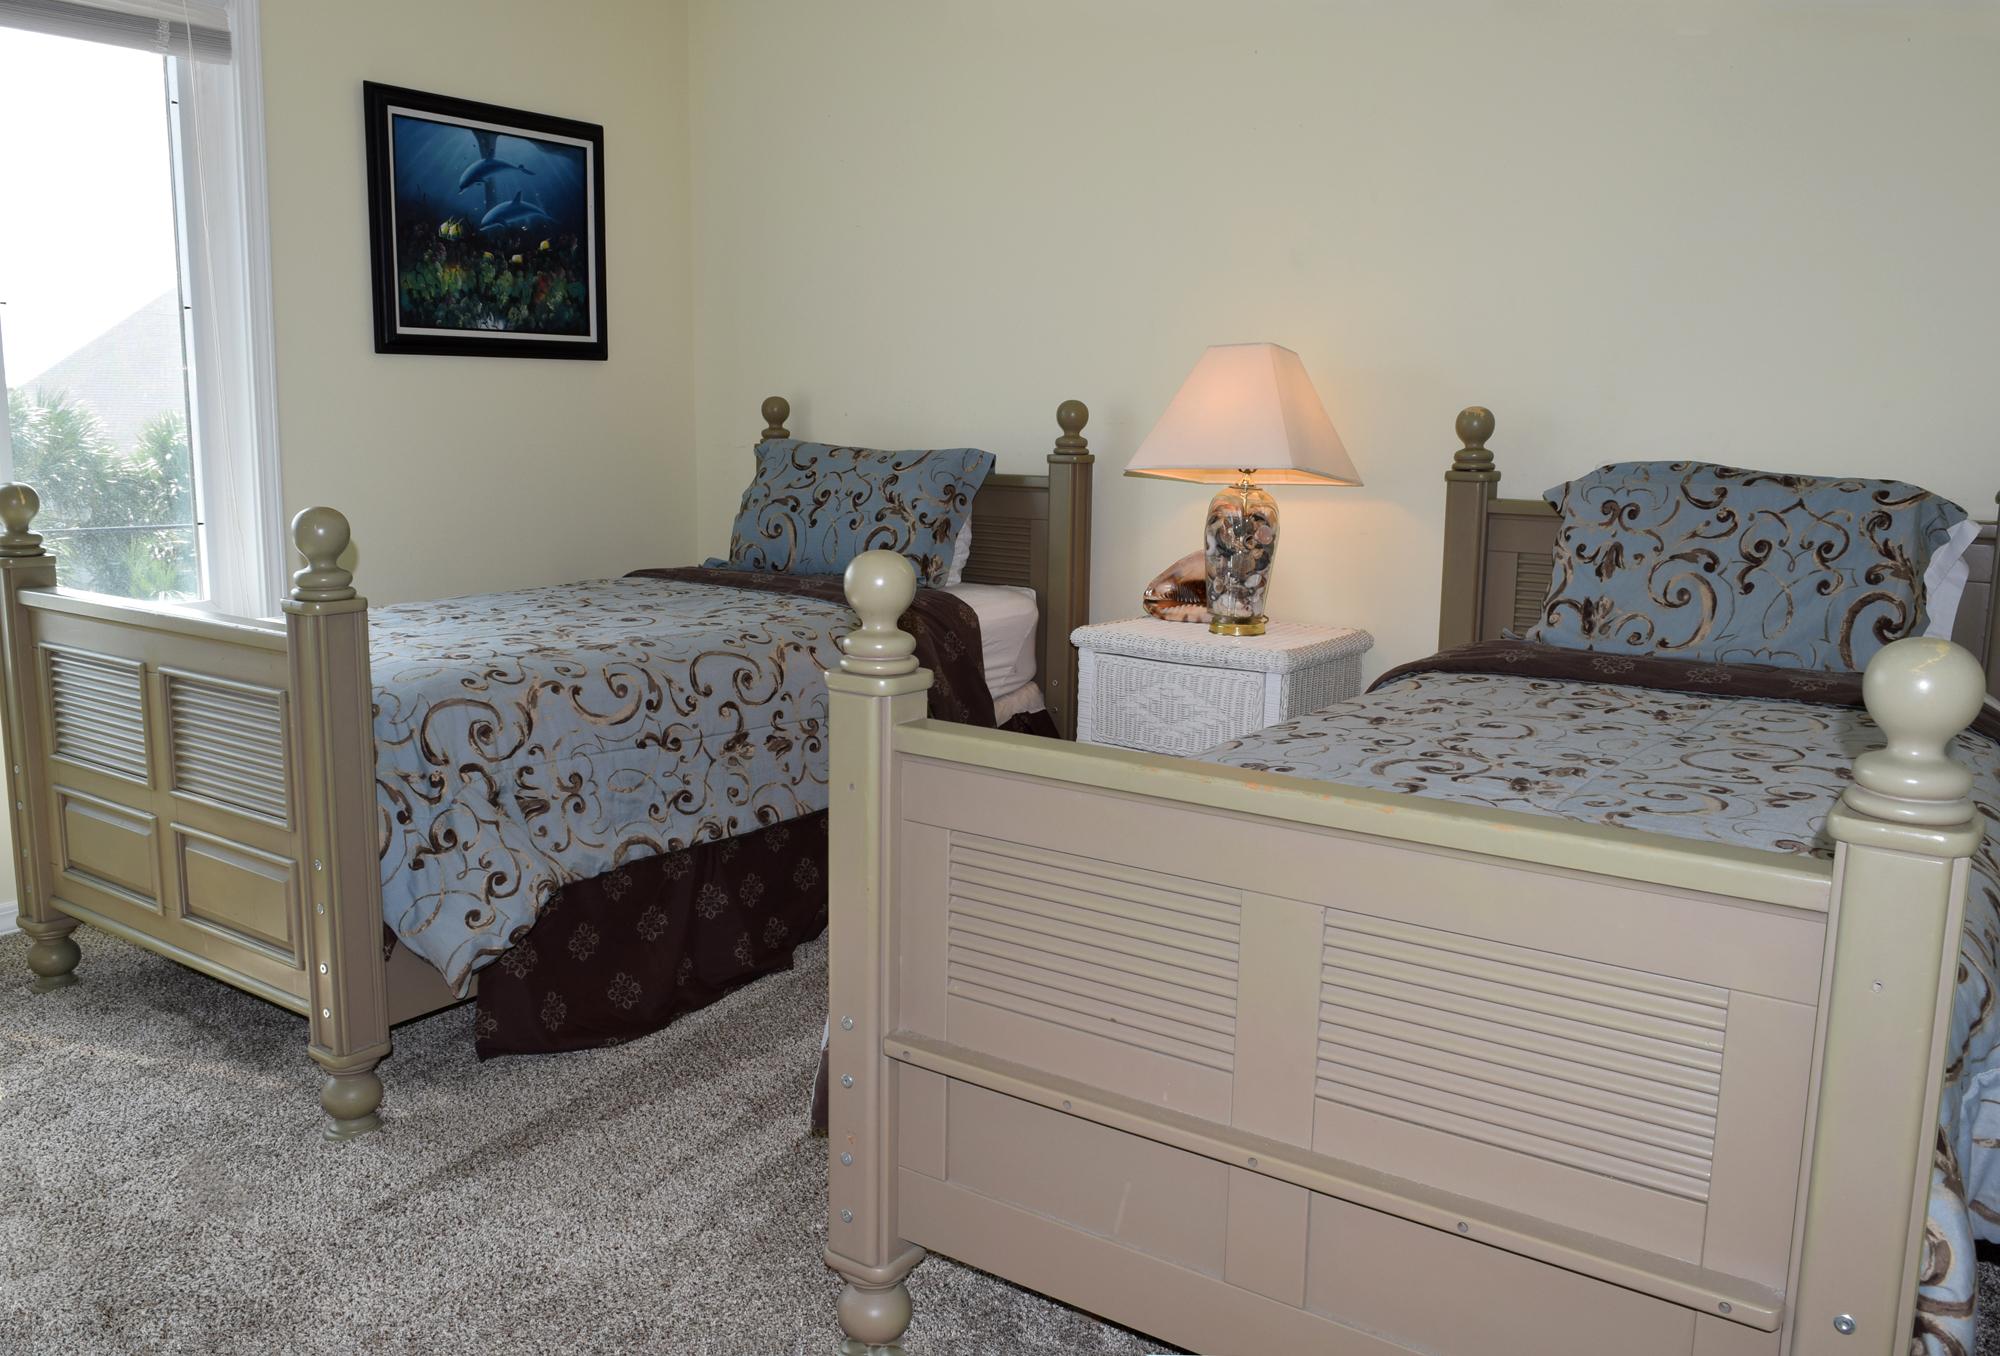 Maldonado 1103 House/Cottage rental in Pensacola Beach House Rentals in Pensacola Beach Florida - #16